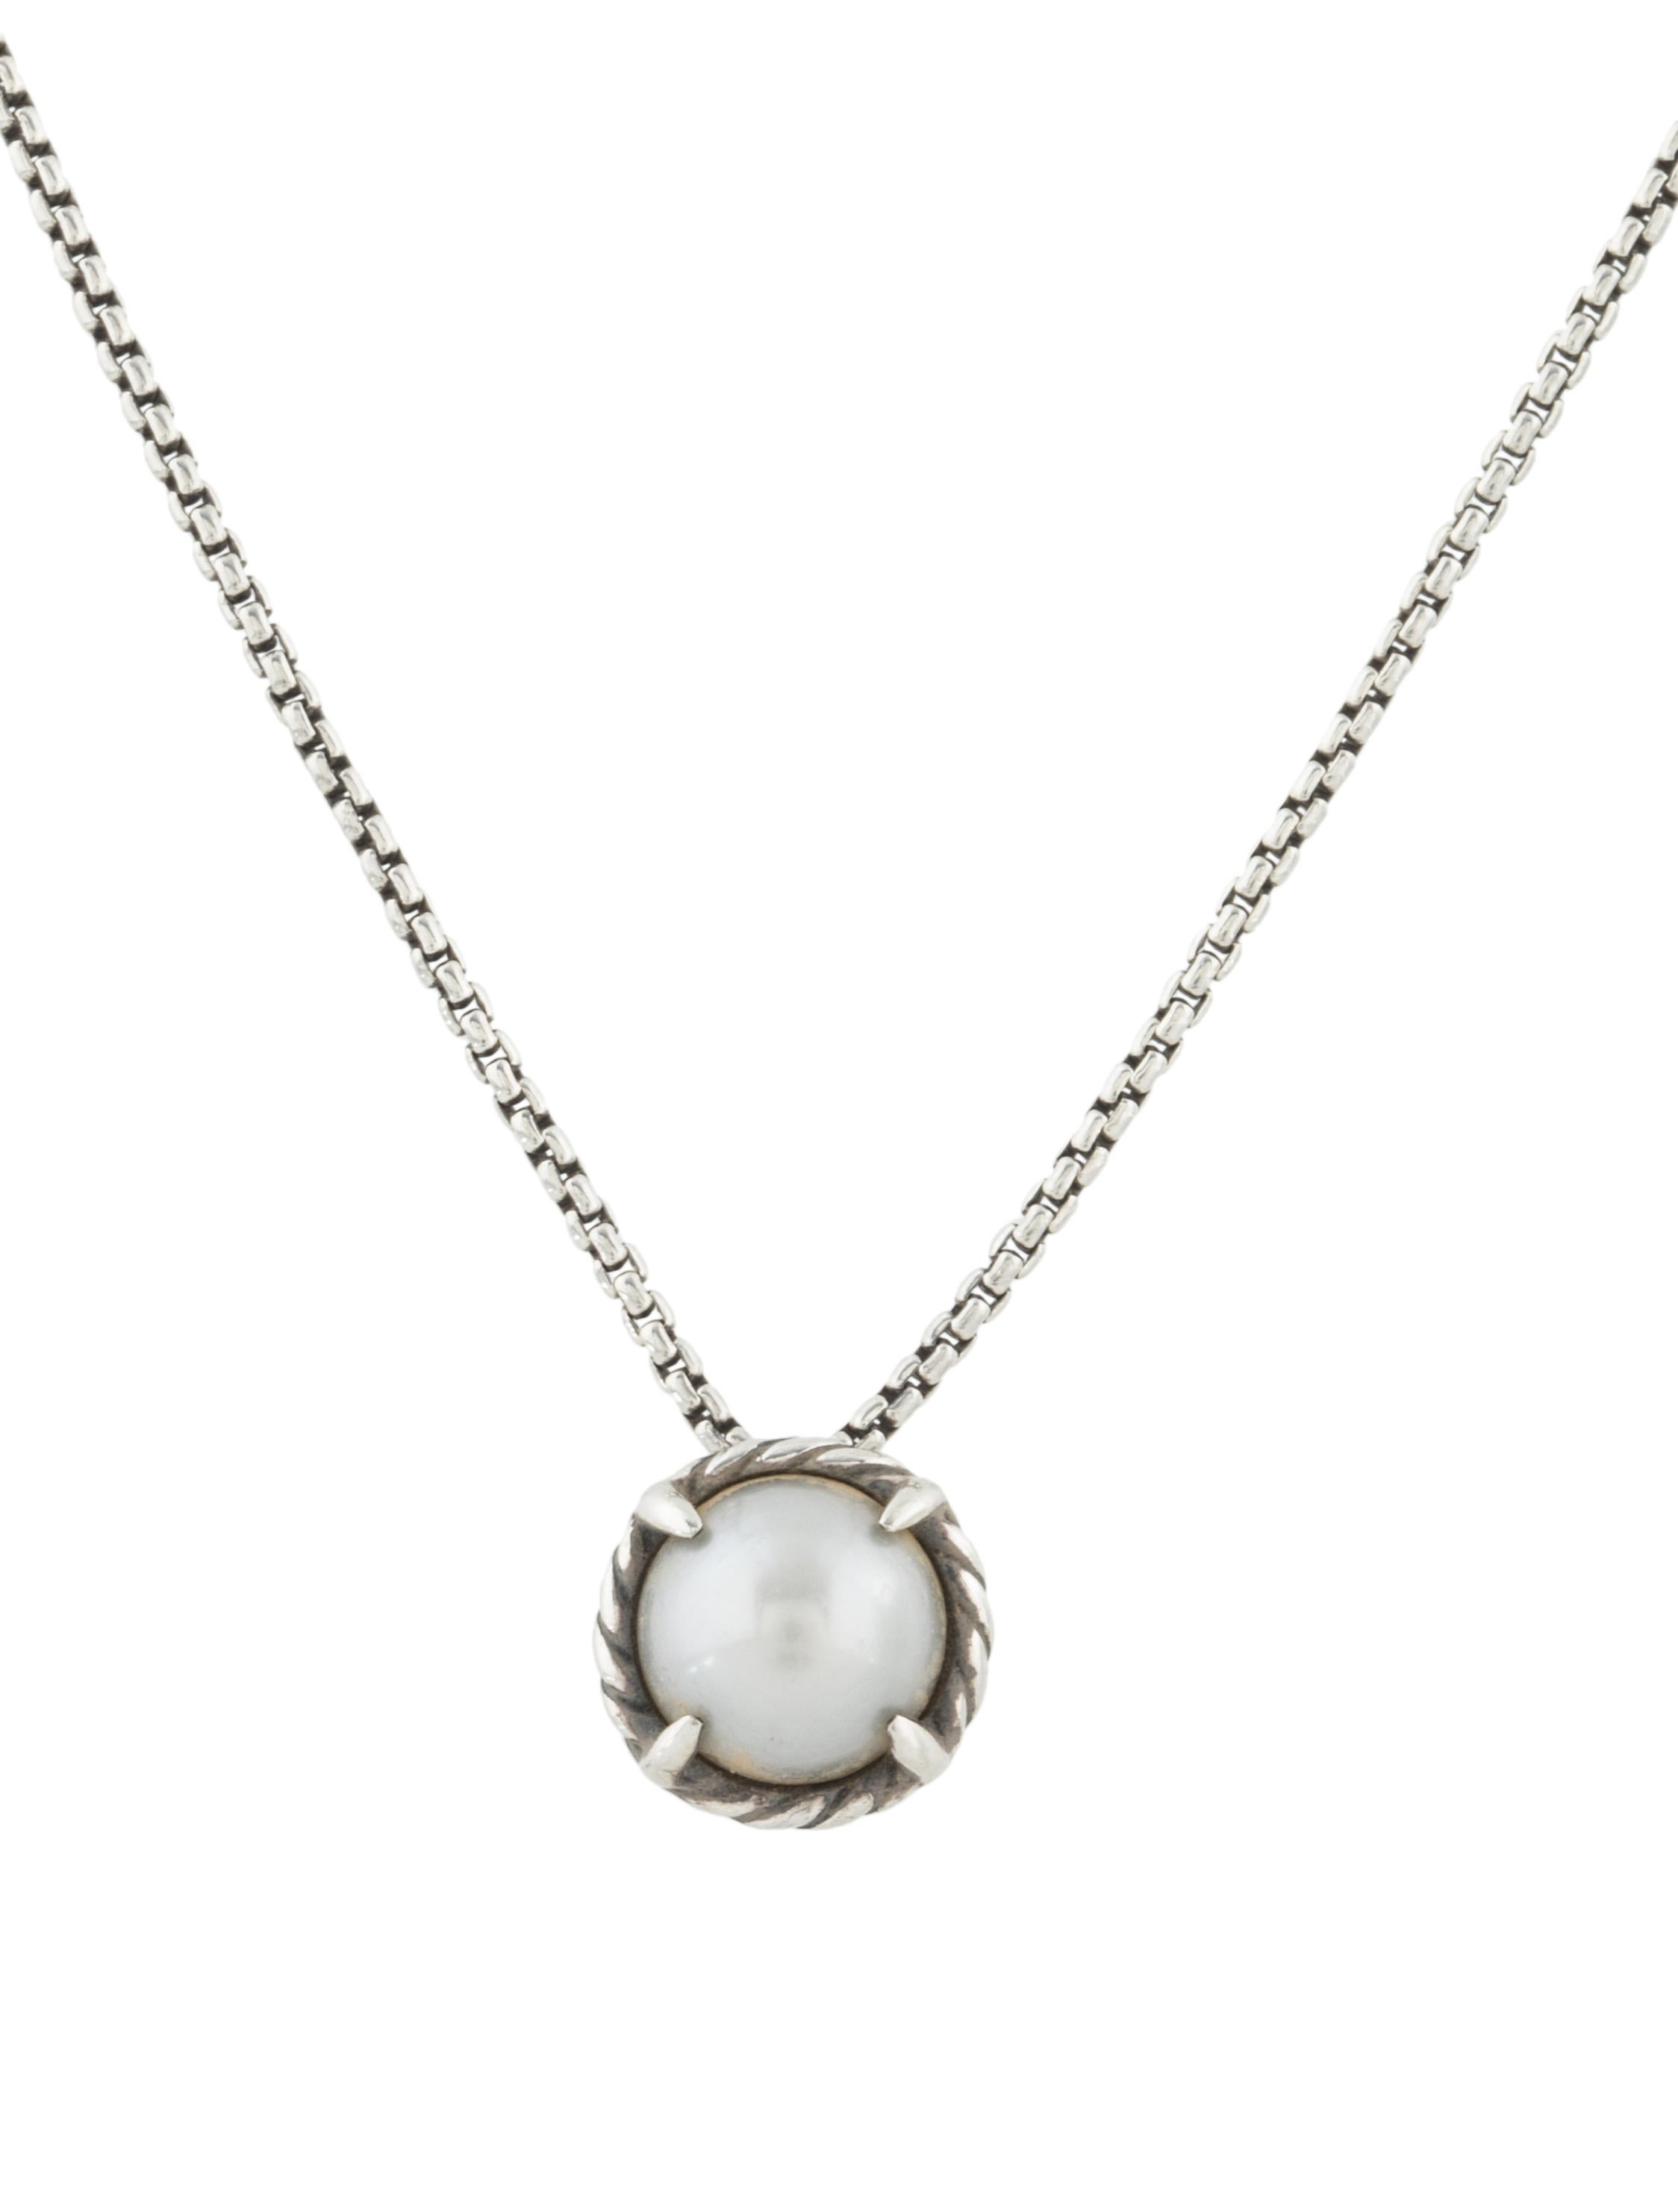 david yurman ch226telaine pearl pendant necklace necklaces